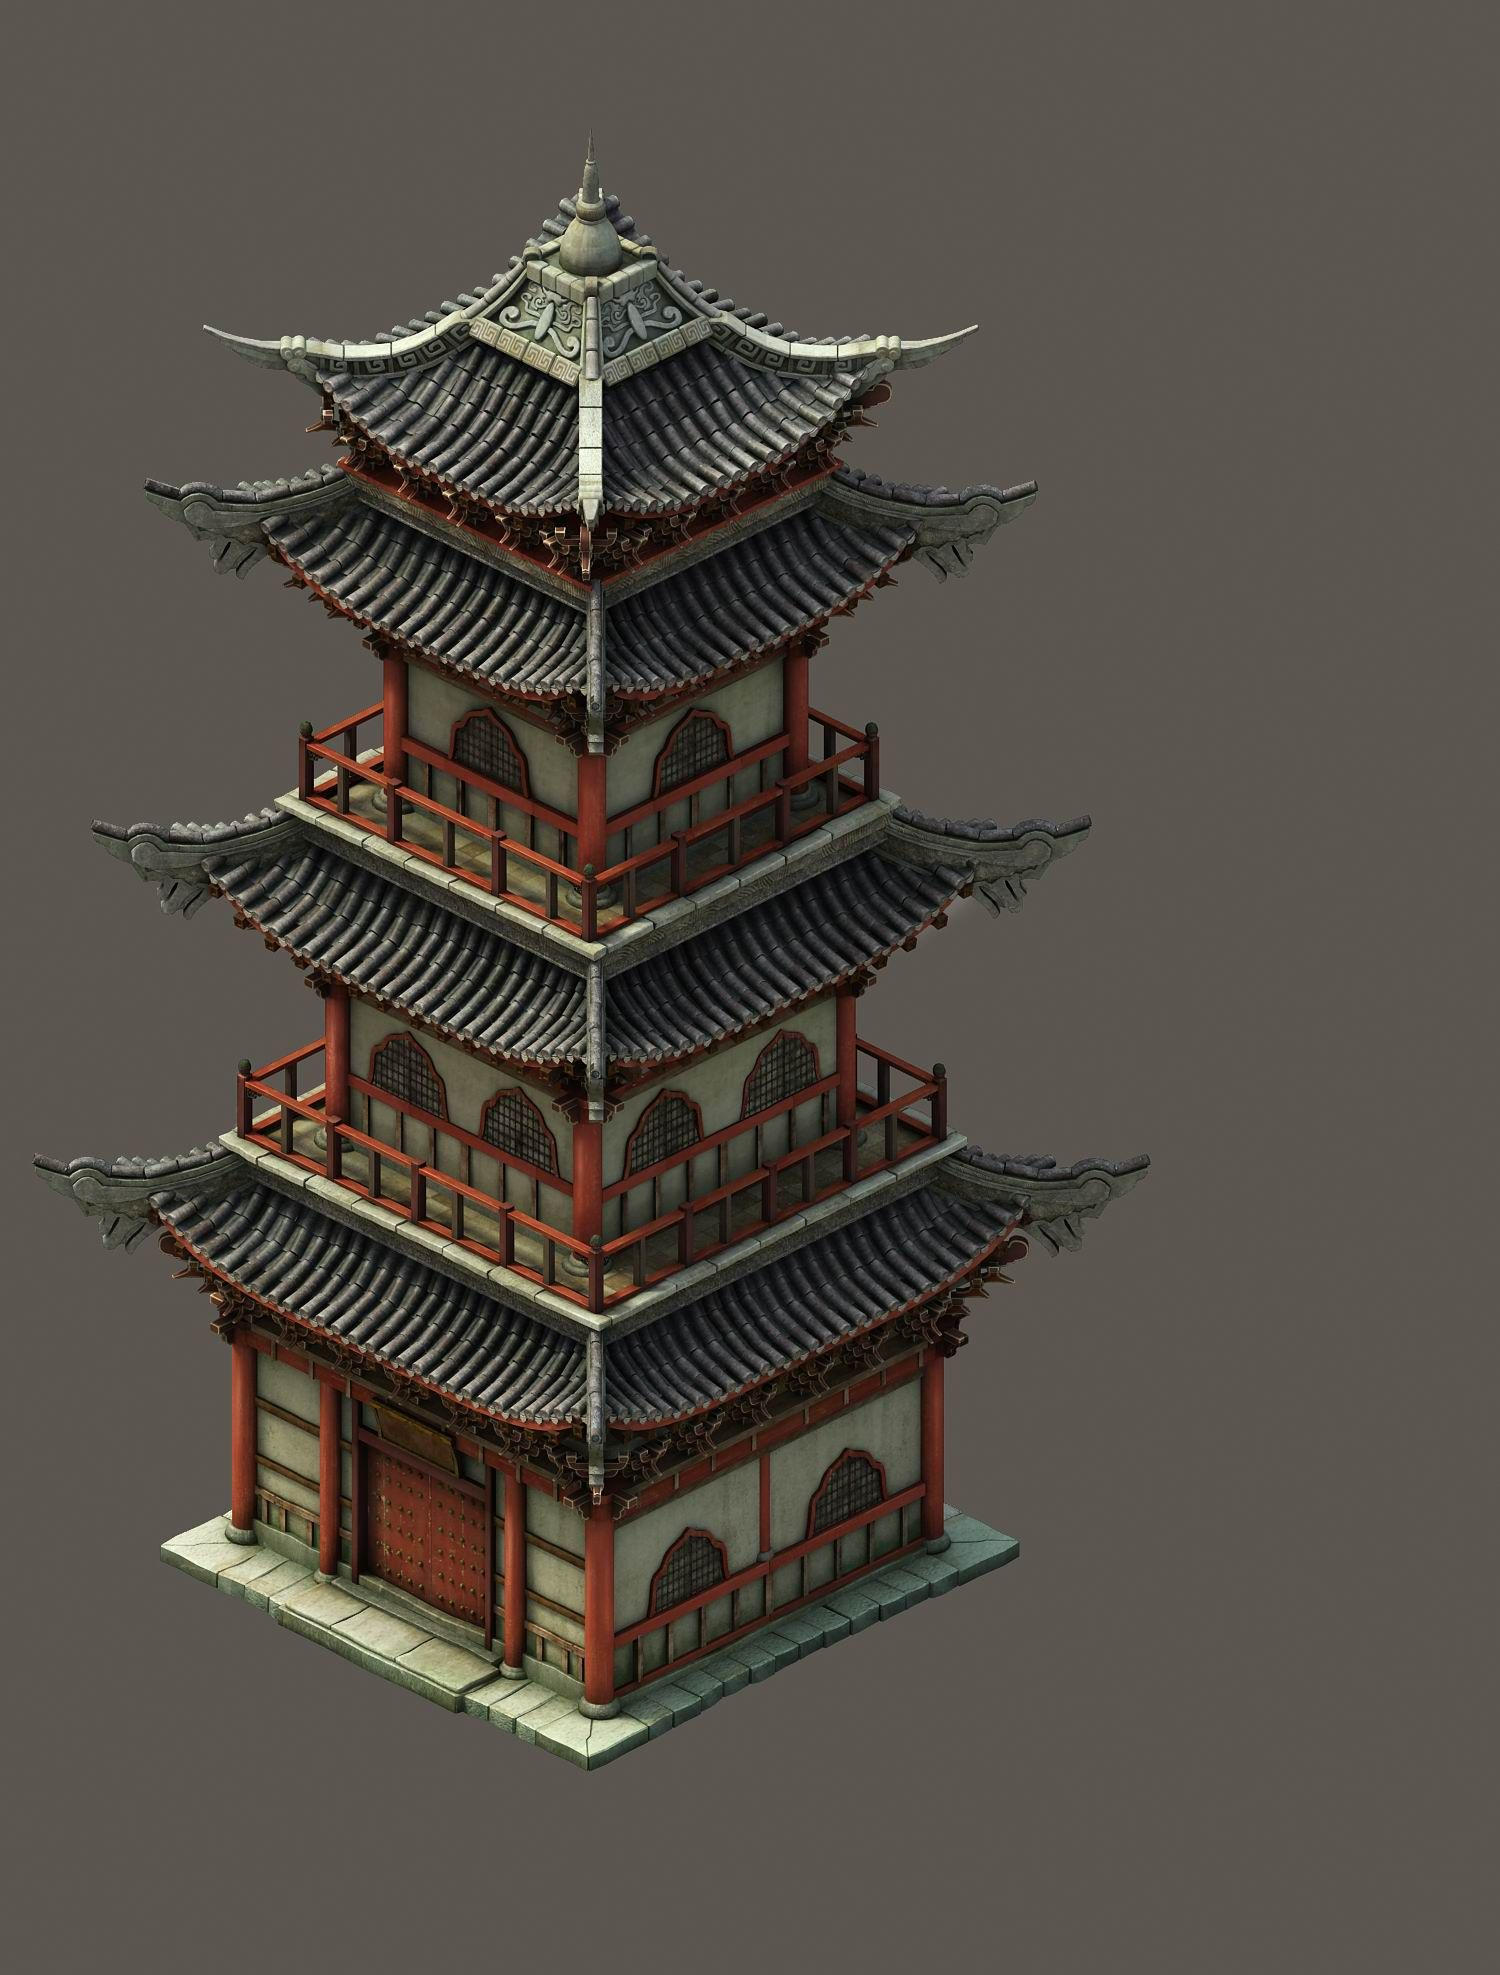 Chinese ancient tower #Chinese, #ancient, #tower in 2019.